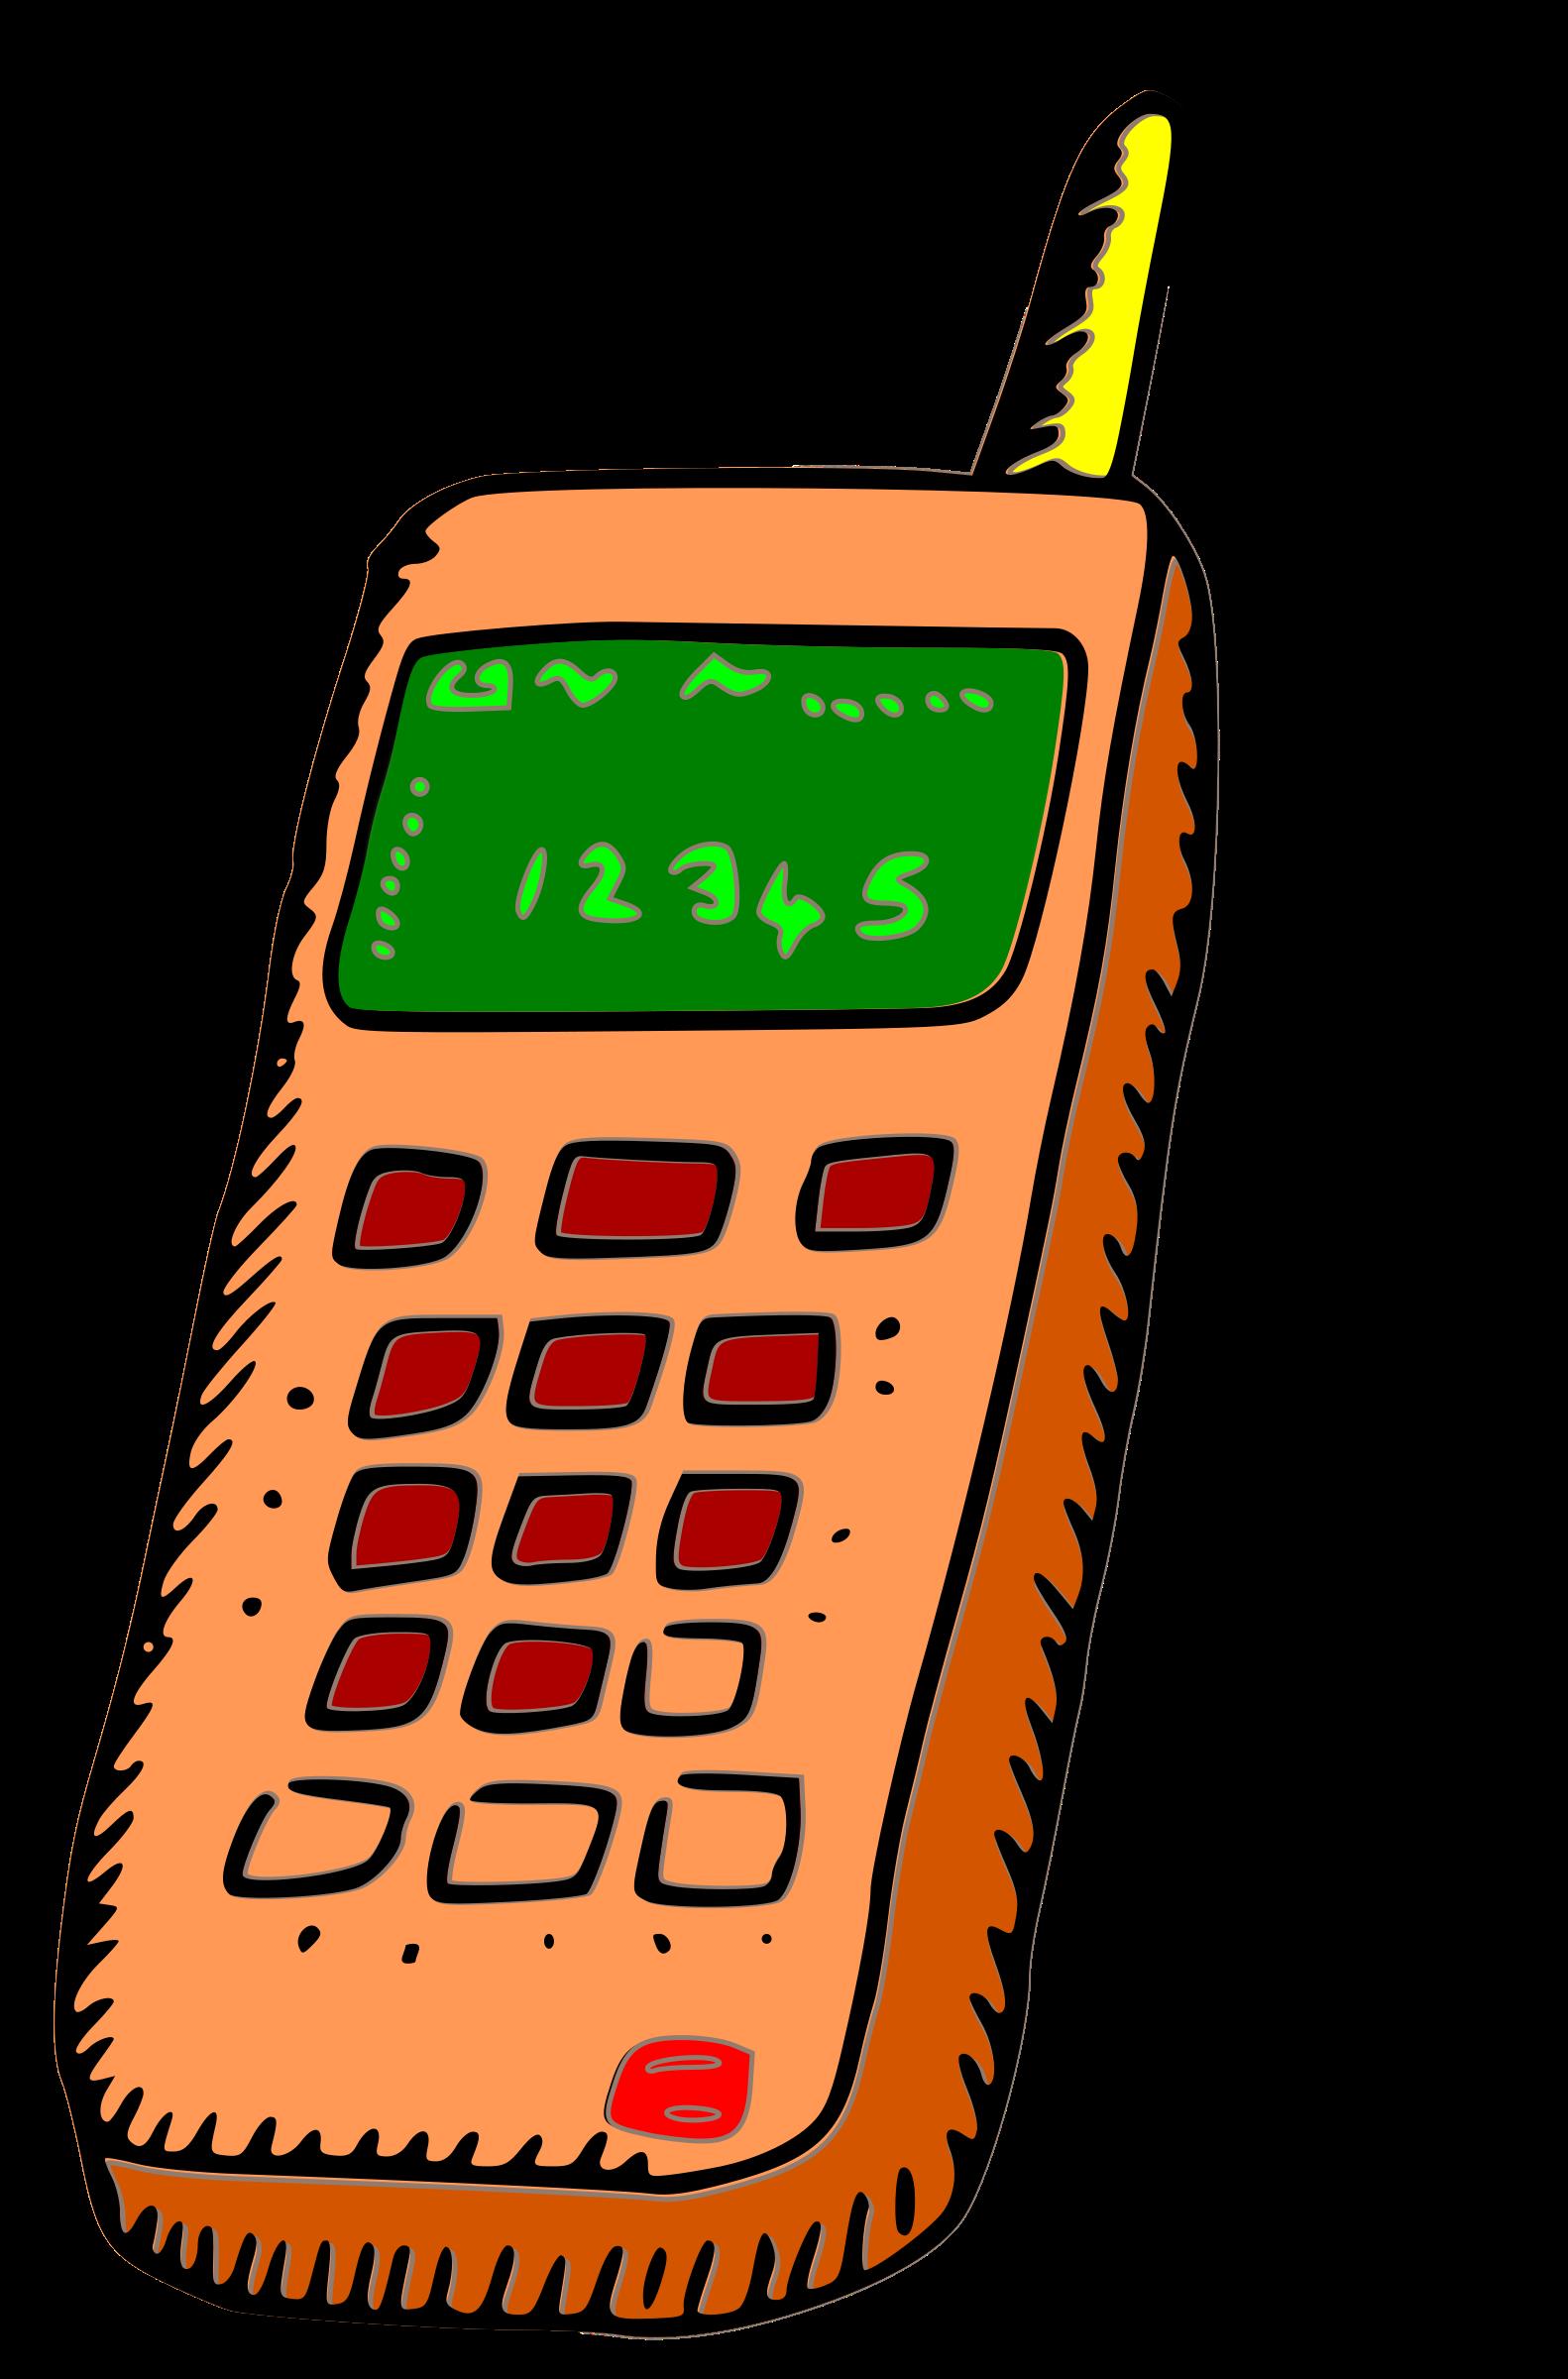 Communication clipart radio communication. Analogue mobile phone icons